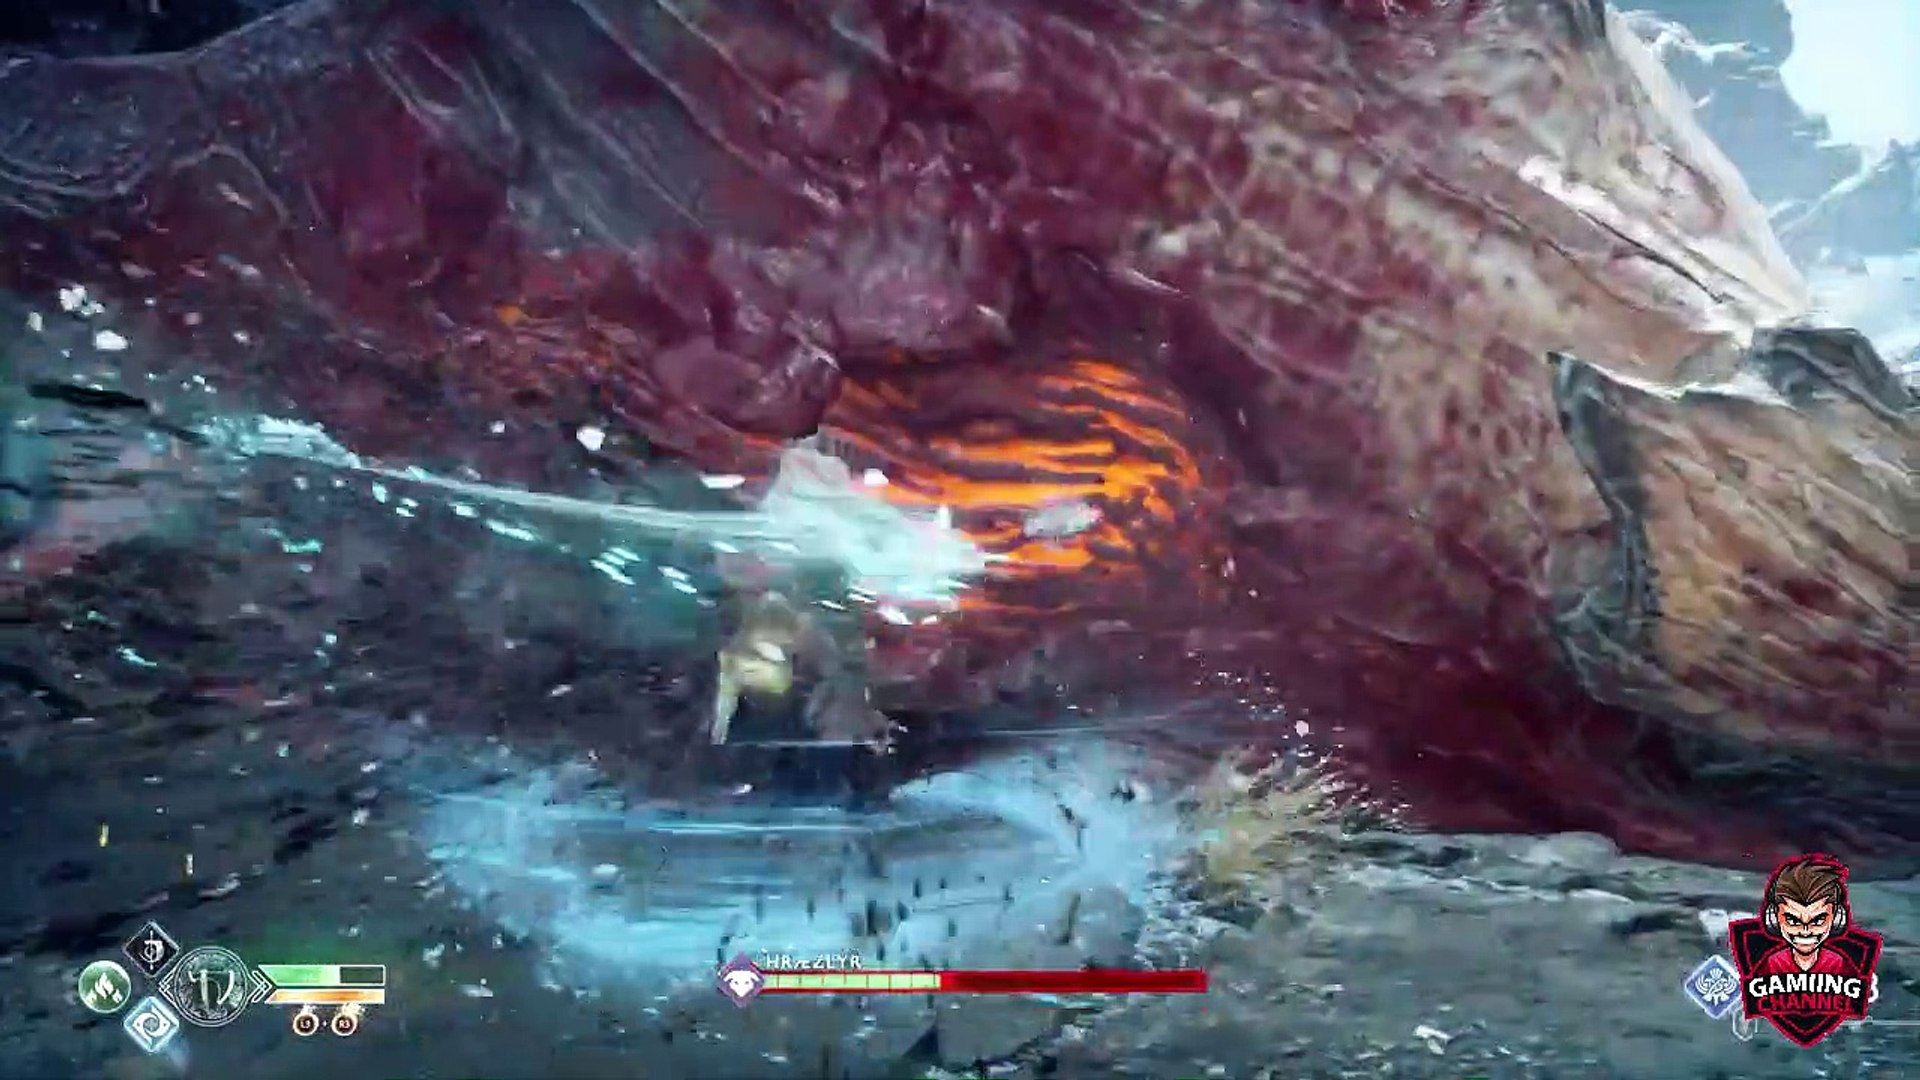 God of War 4 - Dragon Boss Fight (God of War 2019) PS4 Pro